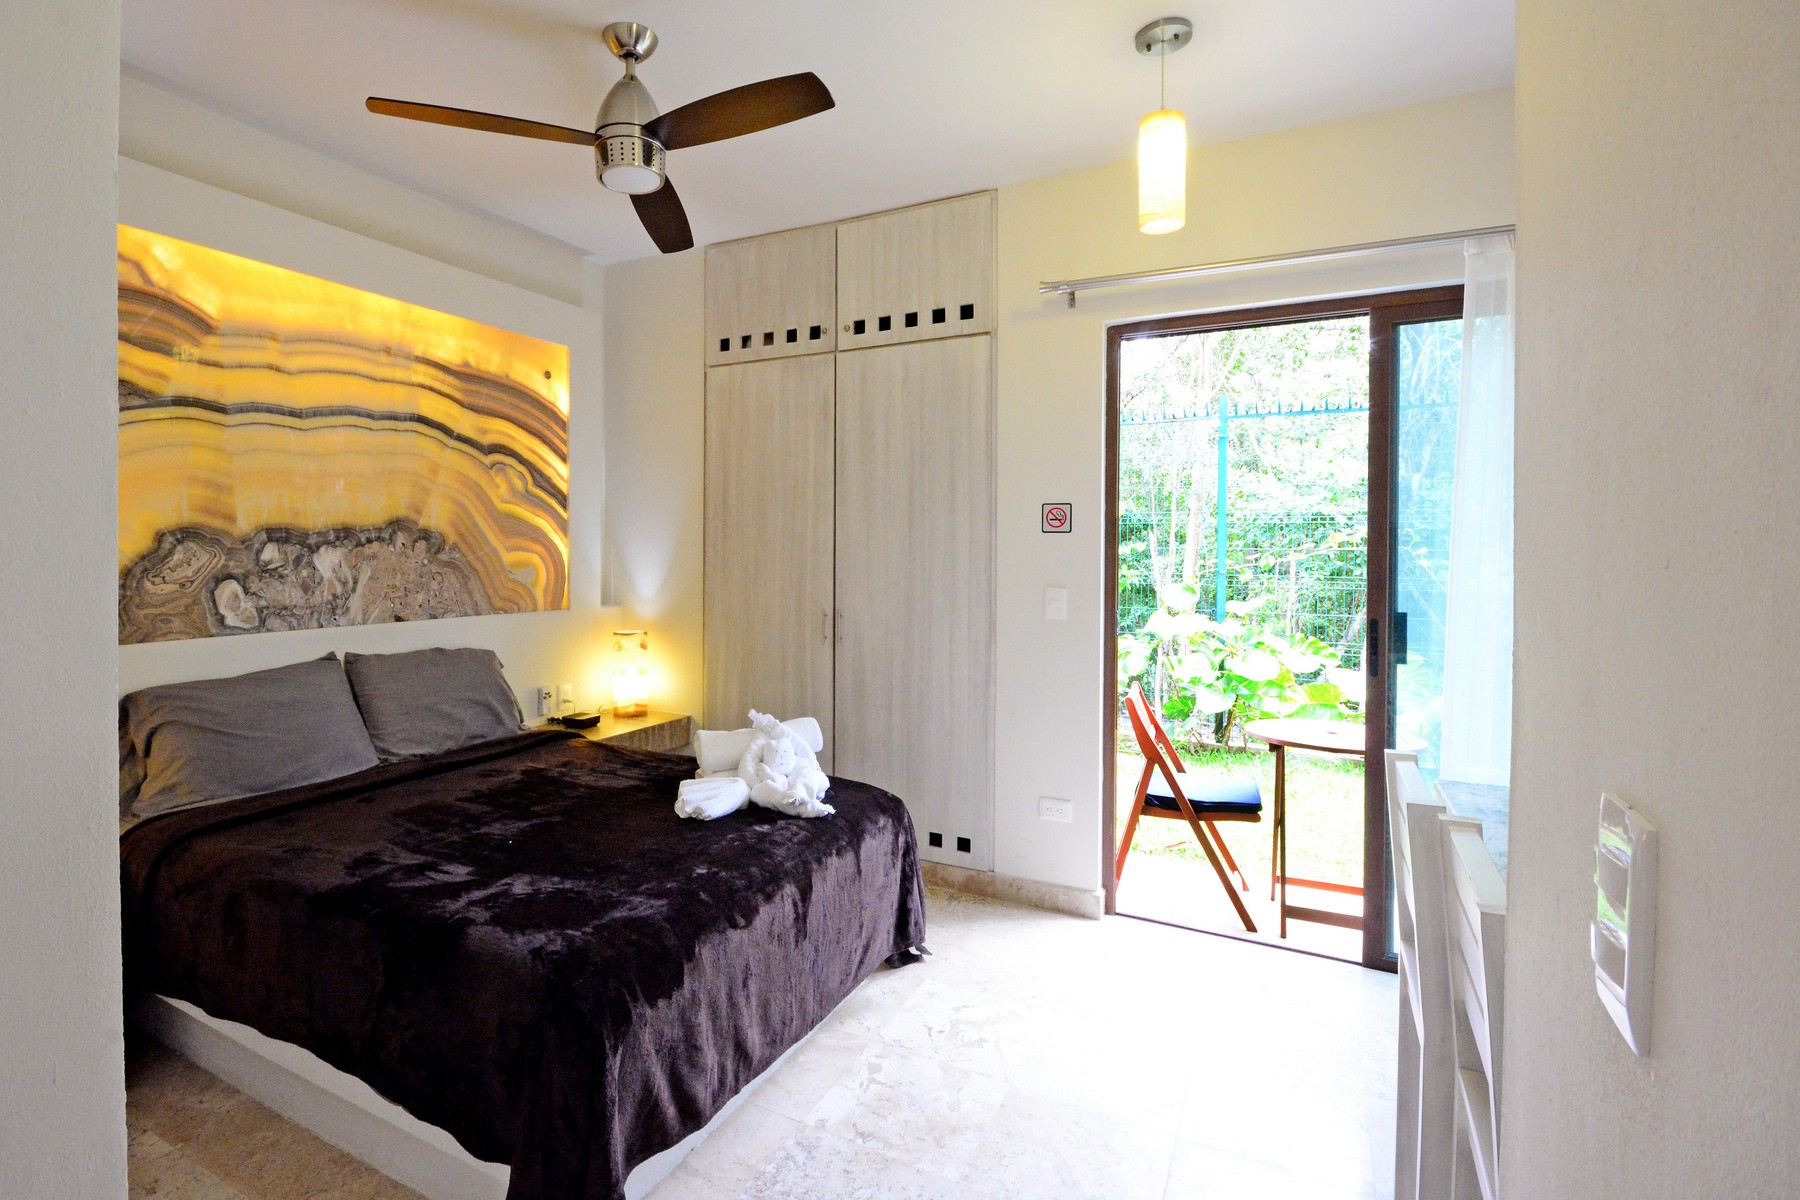 Additional photo for property listing at MODERNO EDIFICIO VISTA VERDE Neptuno Oriente, Lte 016 Tulum, Quintana Roo 77760 México